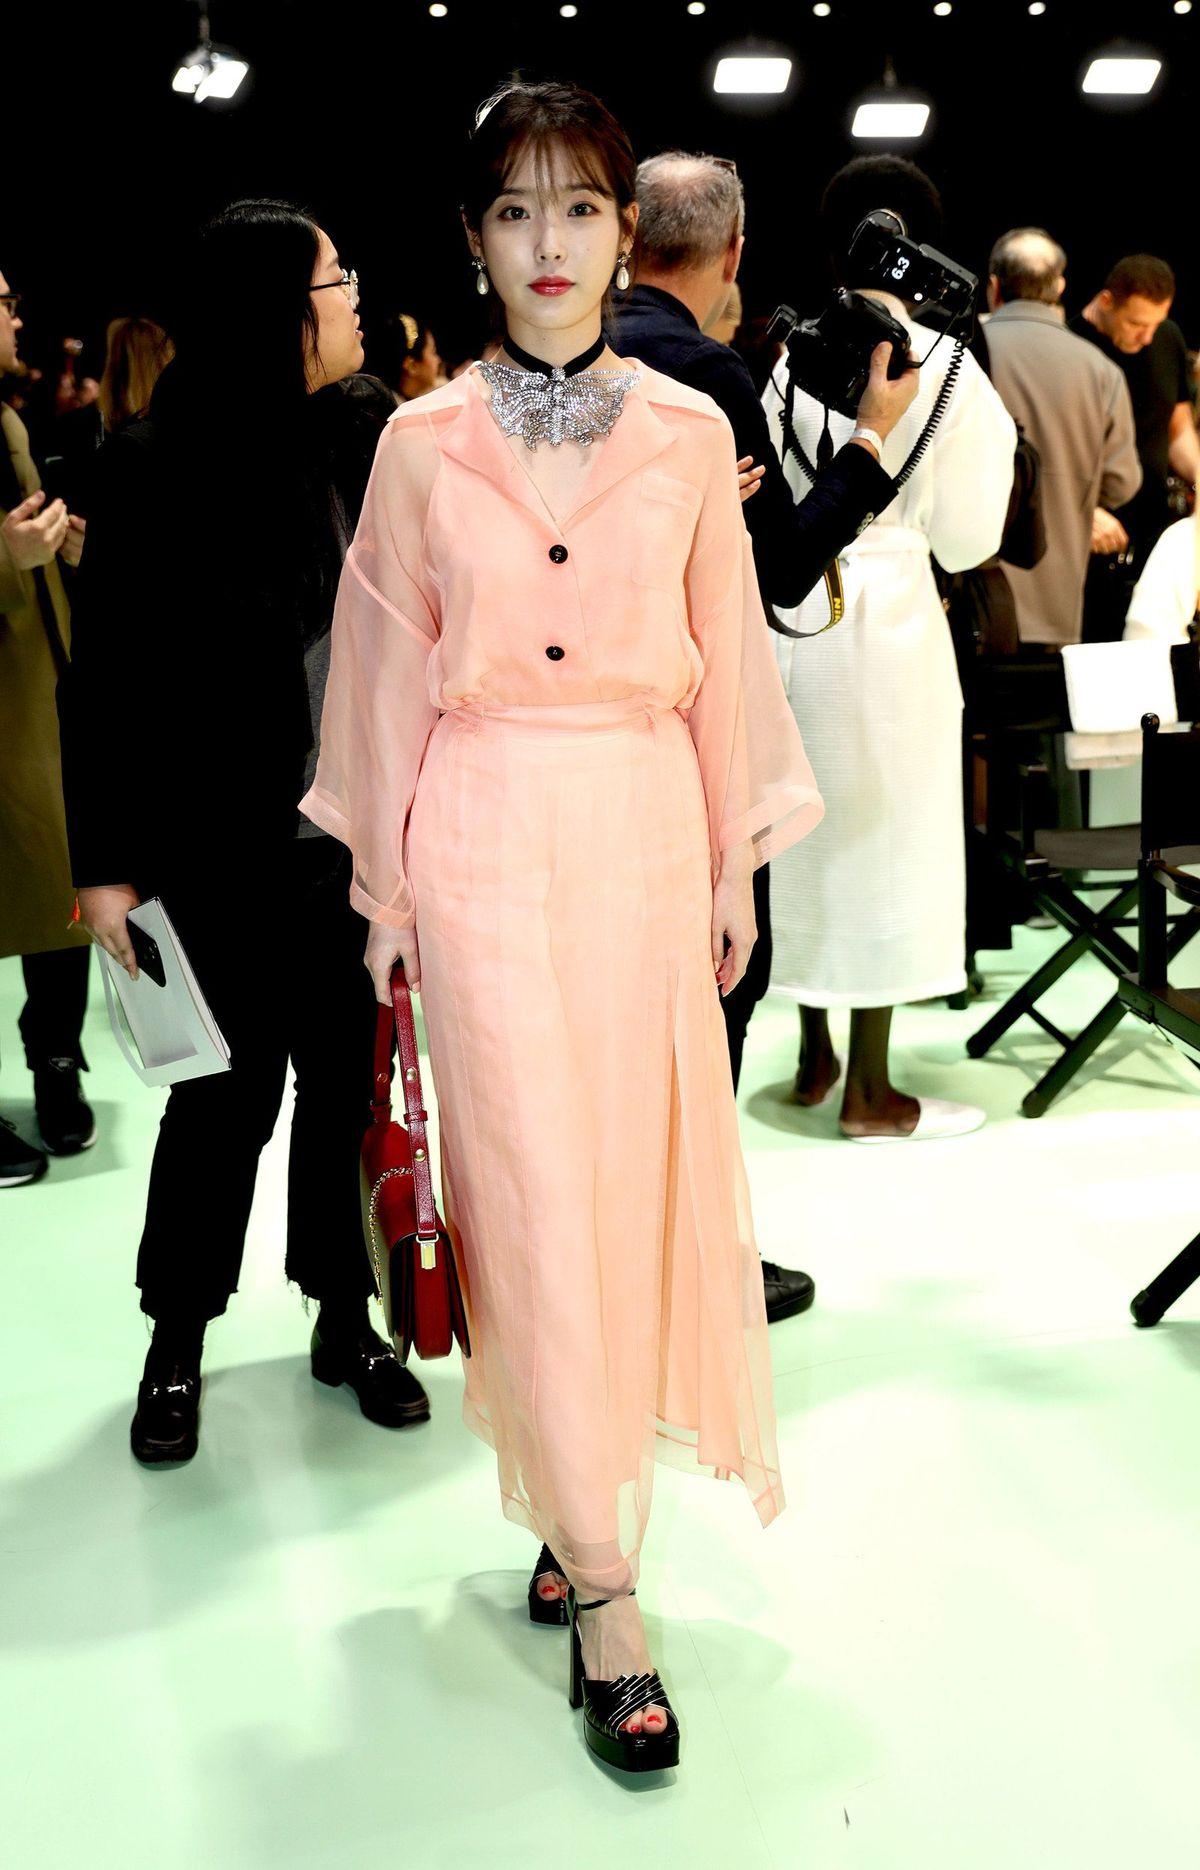 K-Pop Star IU Stole the Show at Gucci's Milan Fashion Week Show